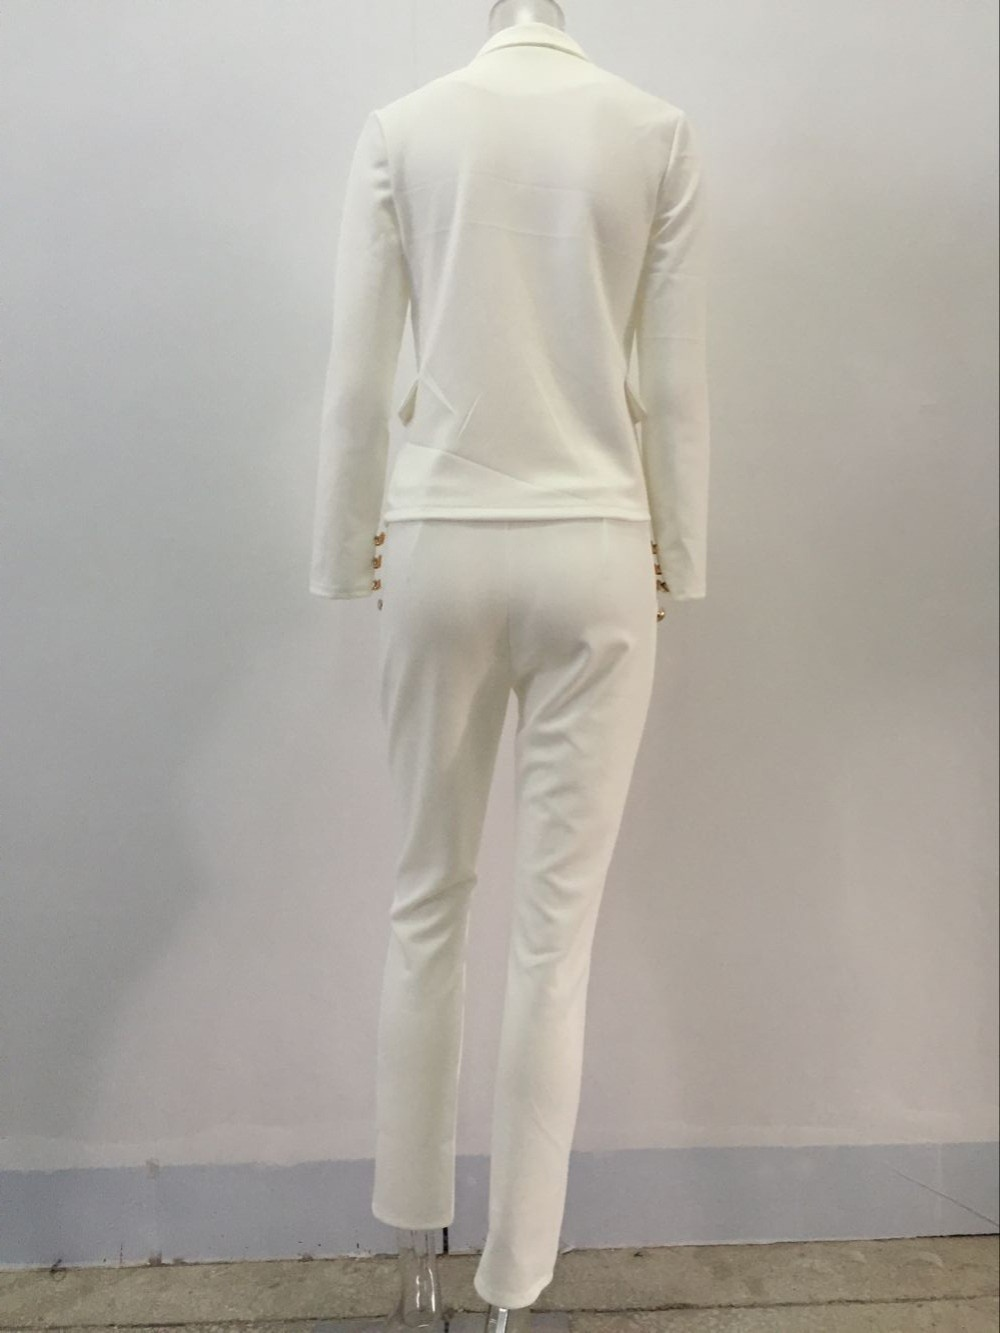 2 Piece Set Women Suit 17 New Formal Office Work Wear Blazer Jacket Tops And Skinny Pants Women Suits Two Piece Set 9